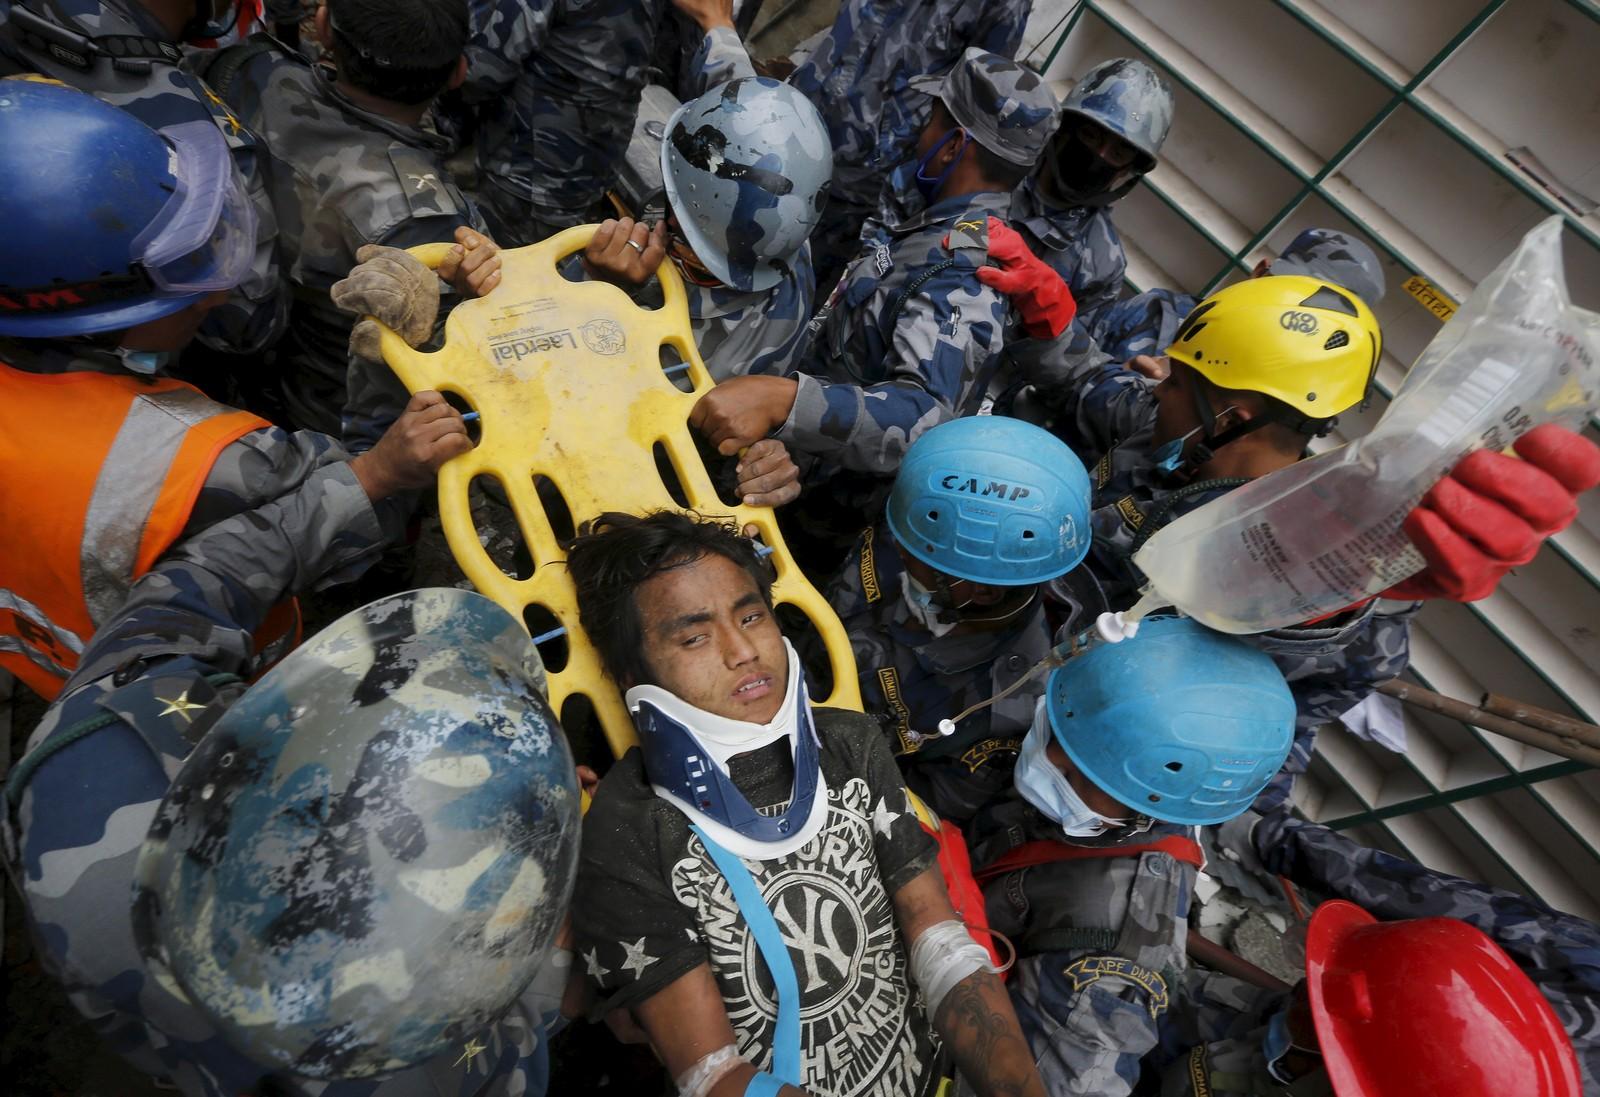 Pemba Tamang (15) overlevde fem dager sammenklemt mellom to etasjer i en blokk i Katmandu, Nepal. REUTERS/Adnan Abidi